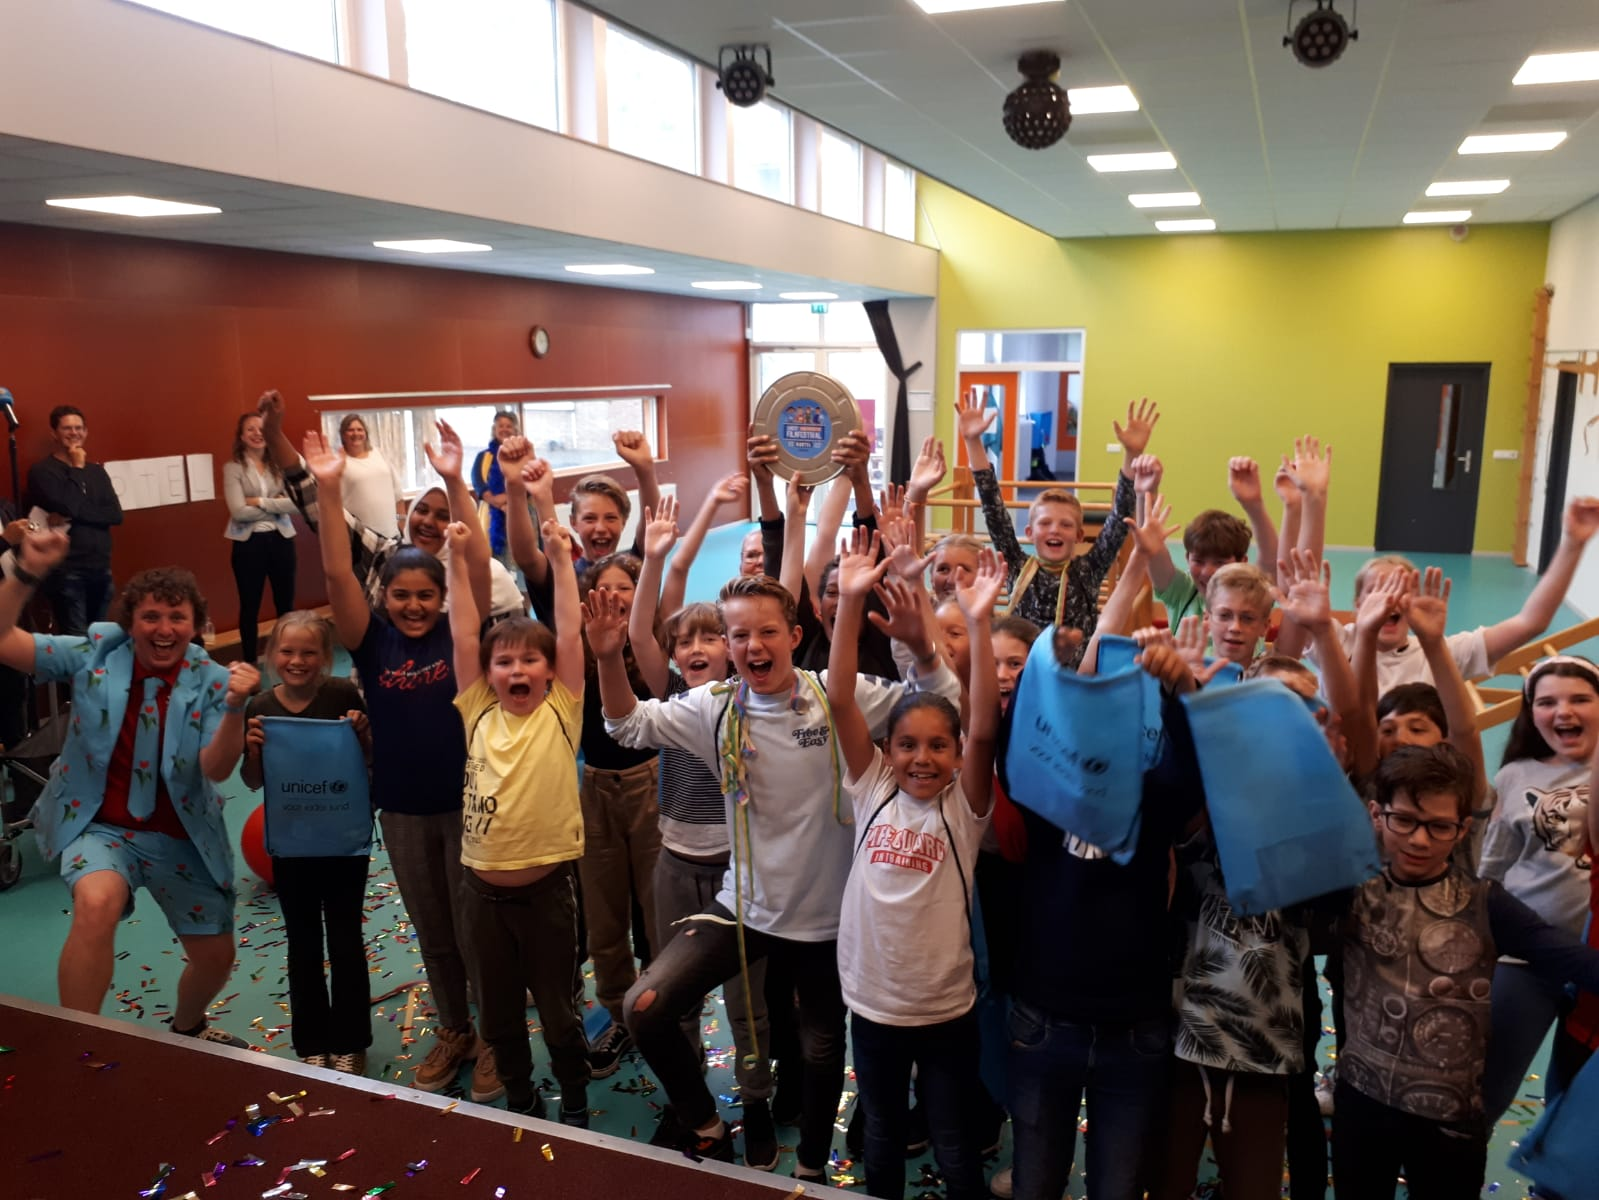 Halve finale Boxtels Unicef kinderrechten filmfestival